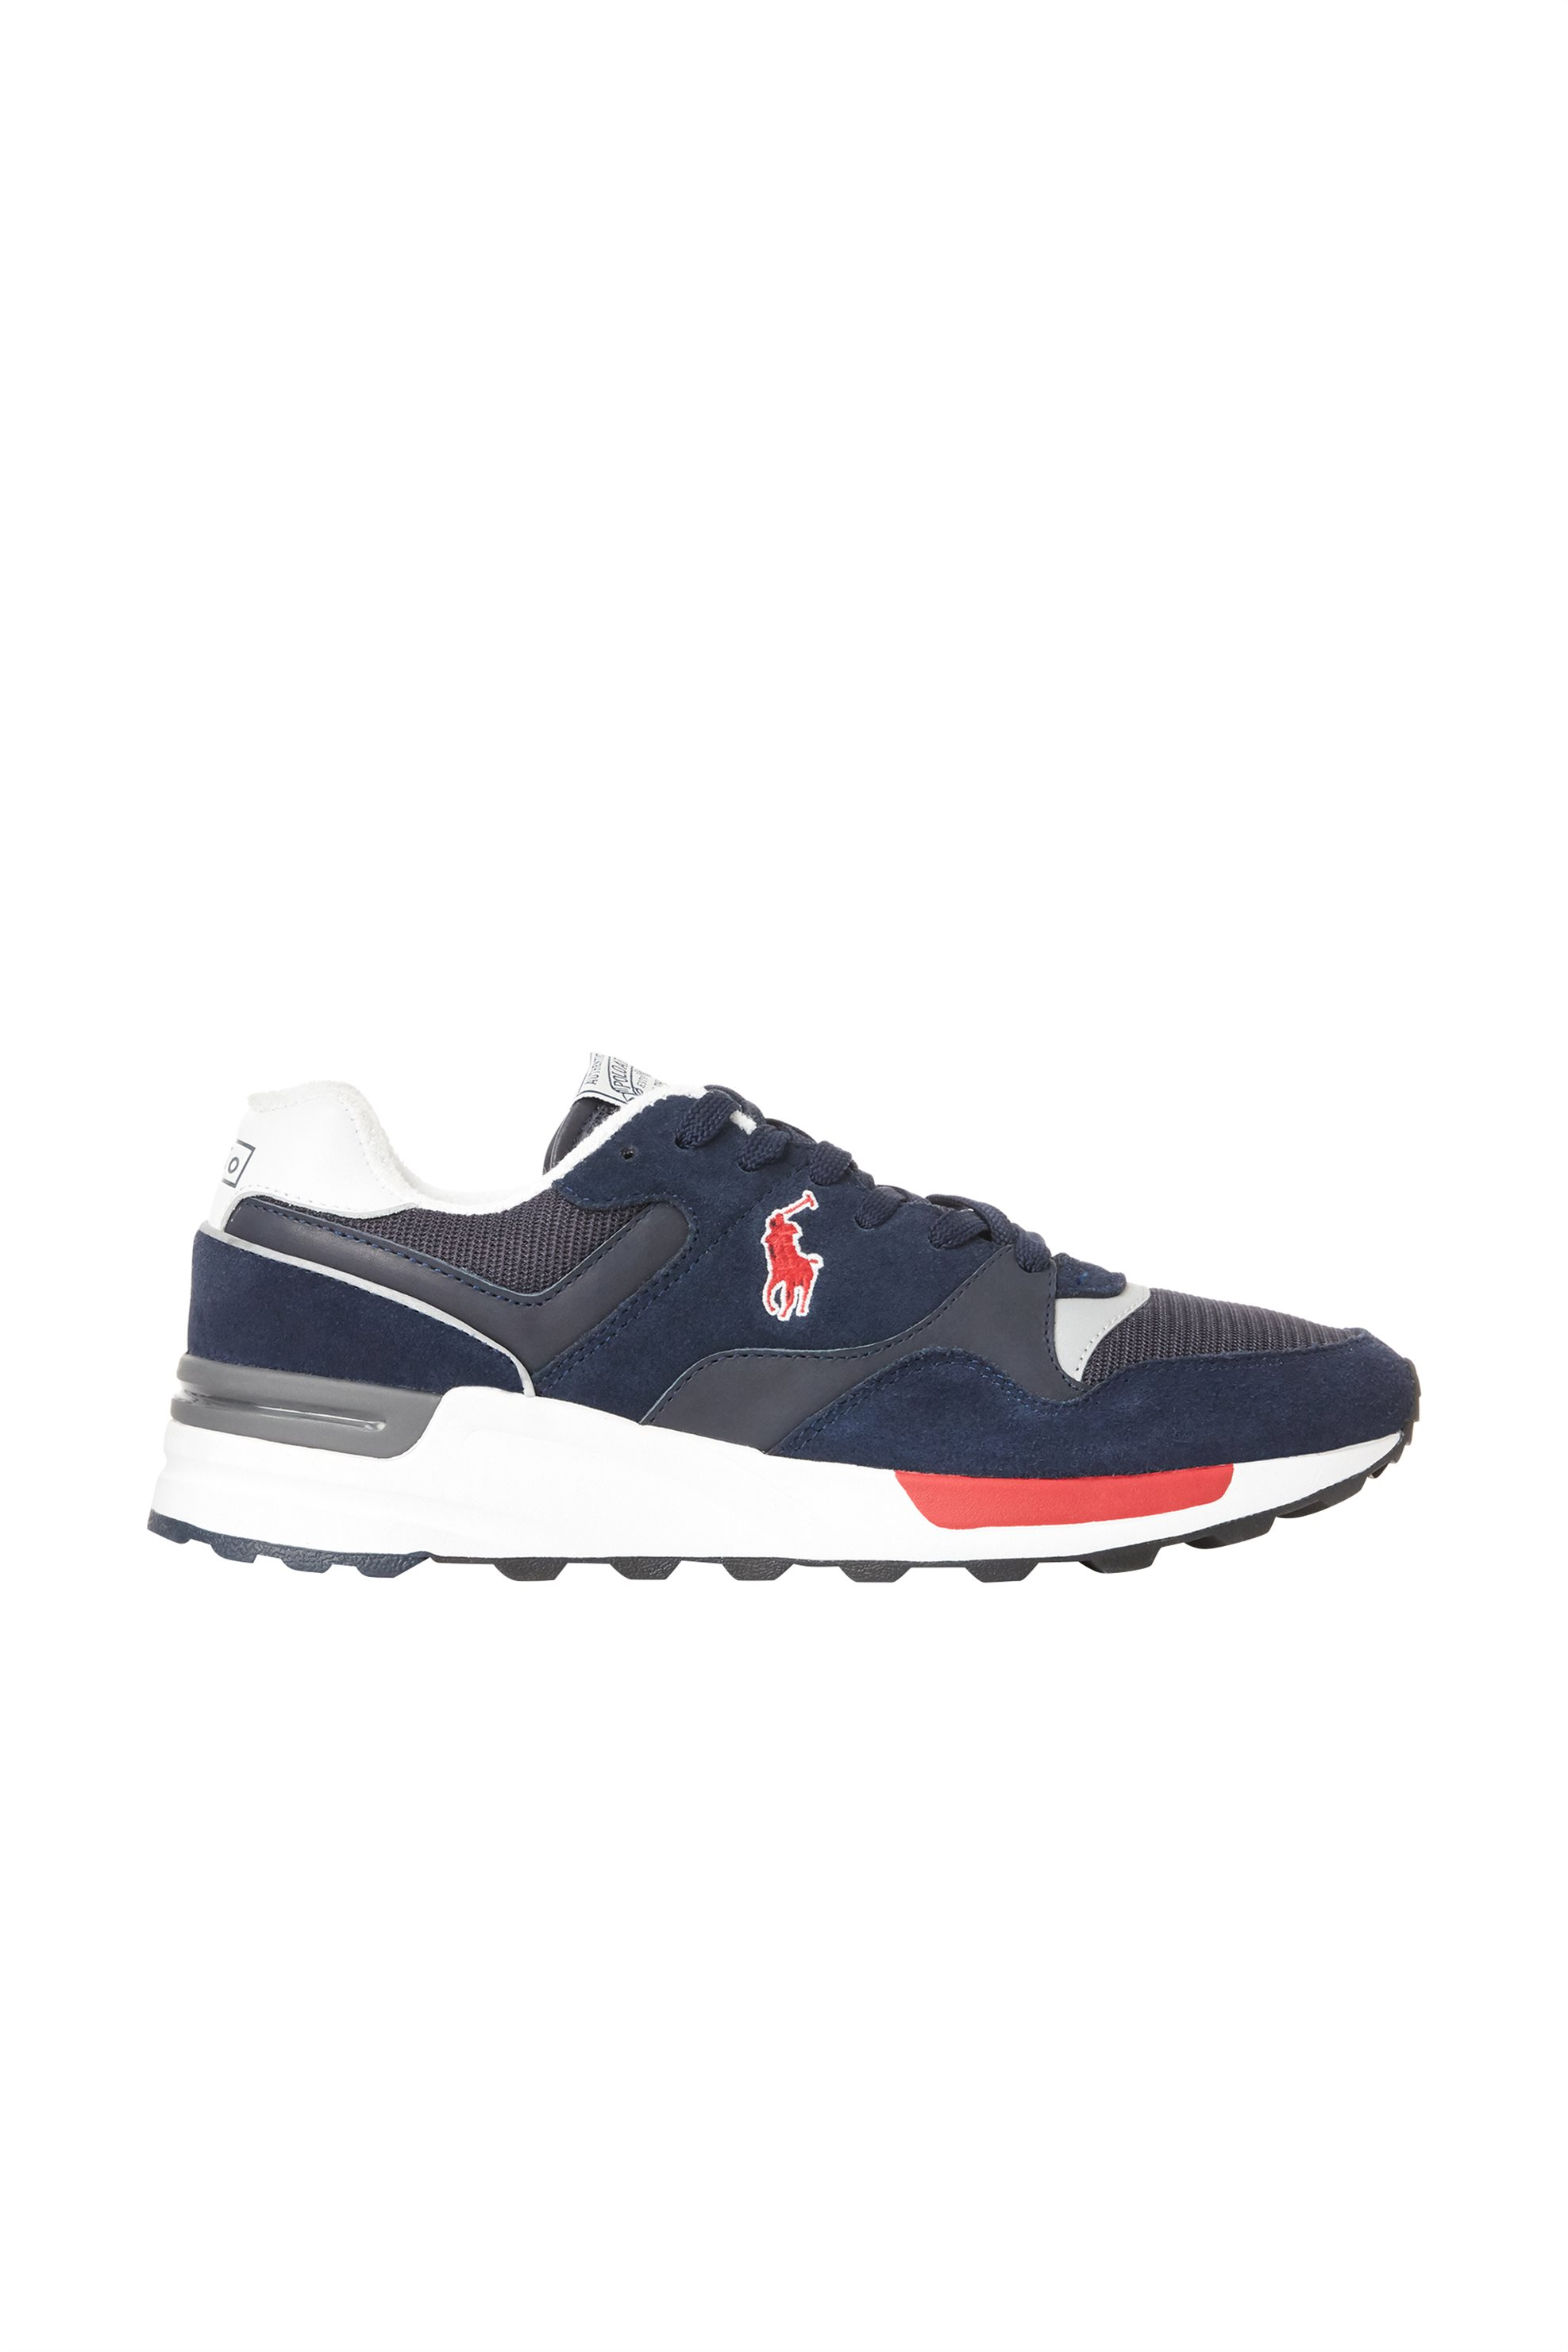 Polo Ralph Lauren ανδρικά suede sneakers με κορδόνια – 809773080001 – Μπλε Σκούρο